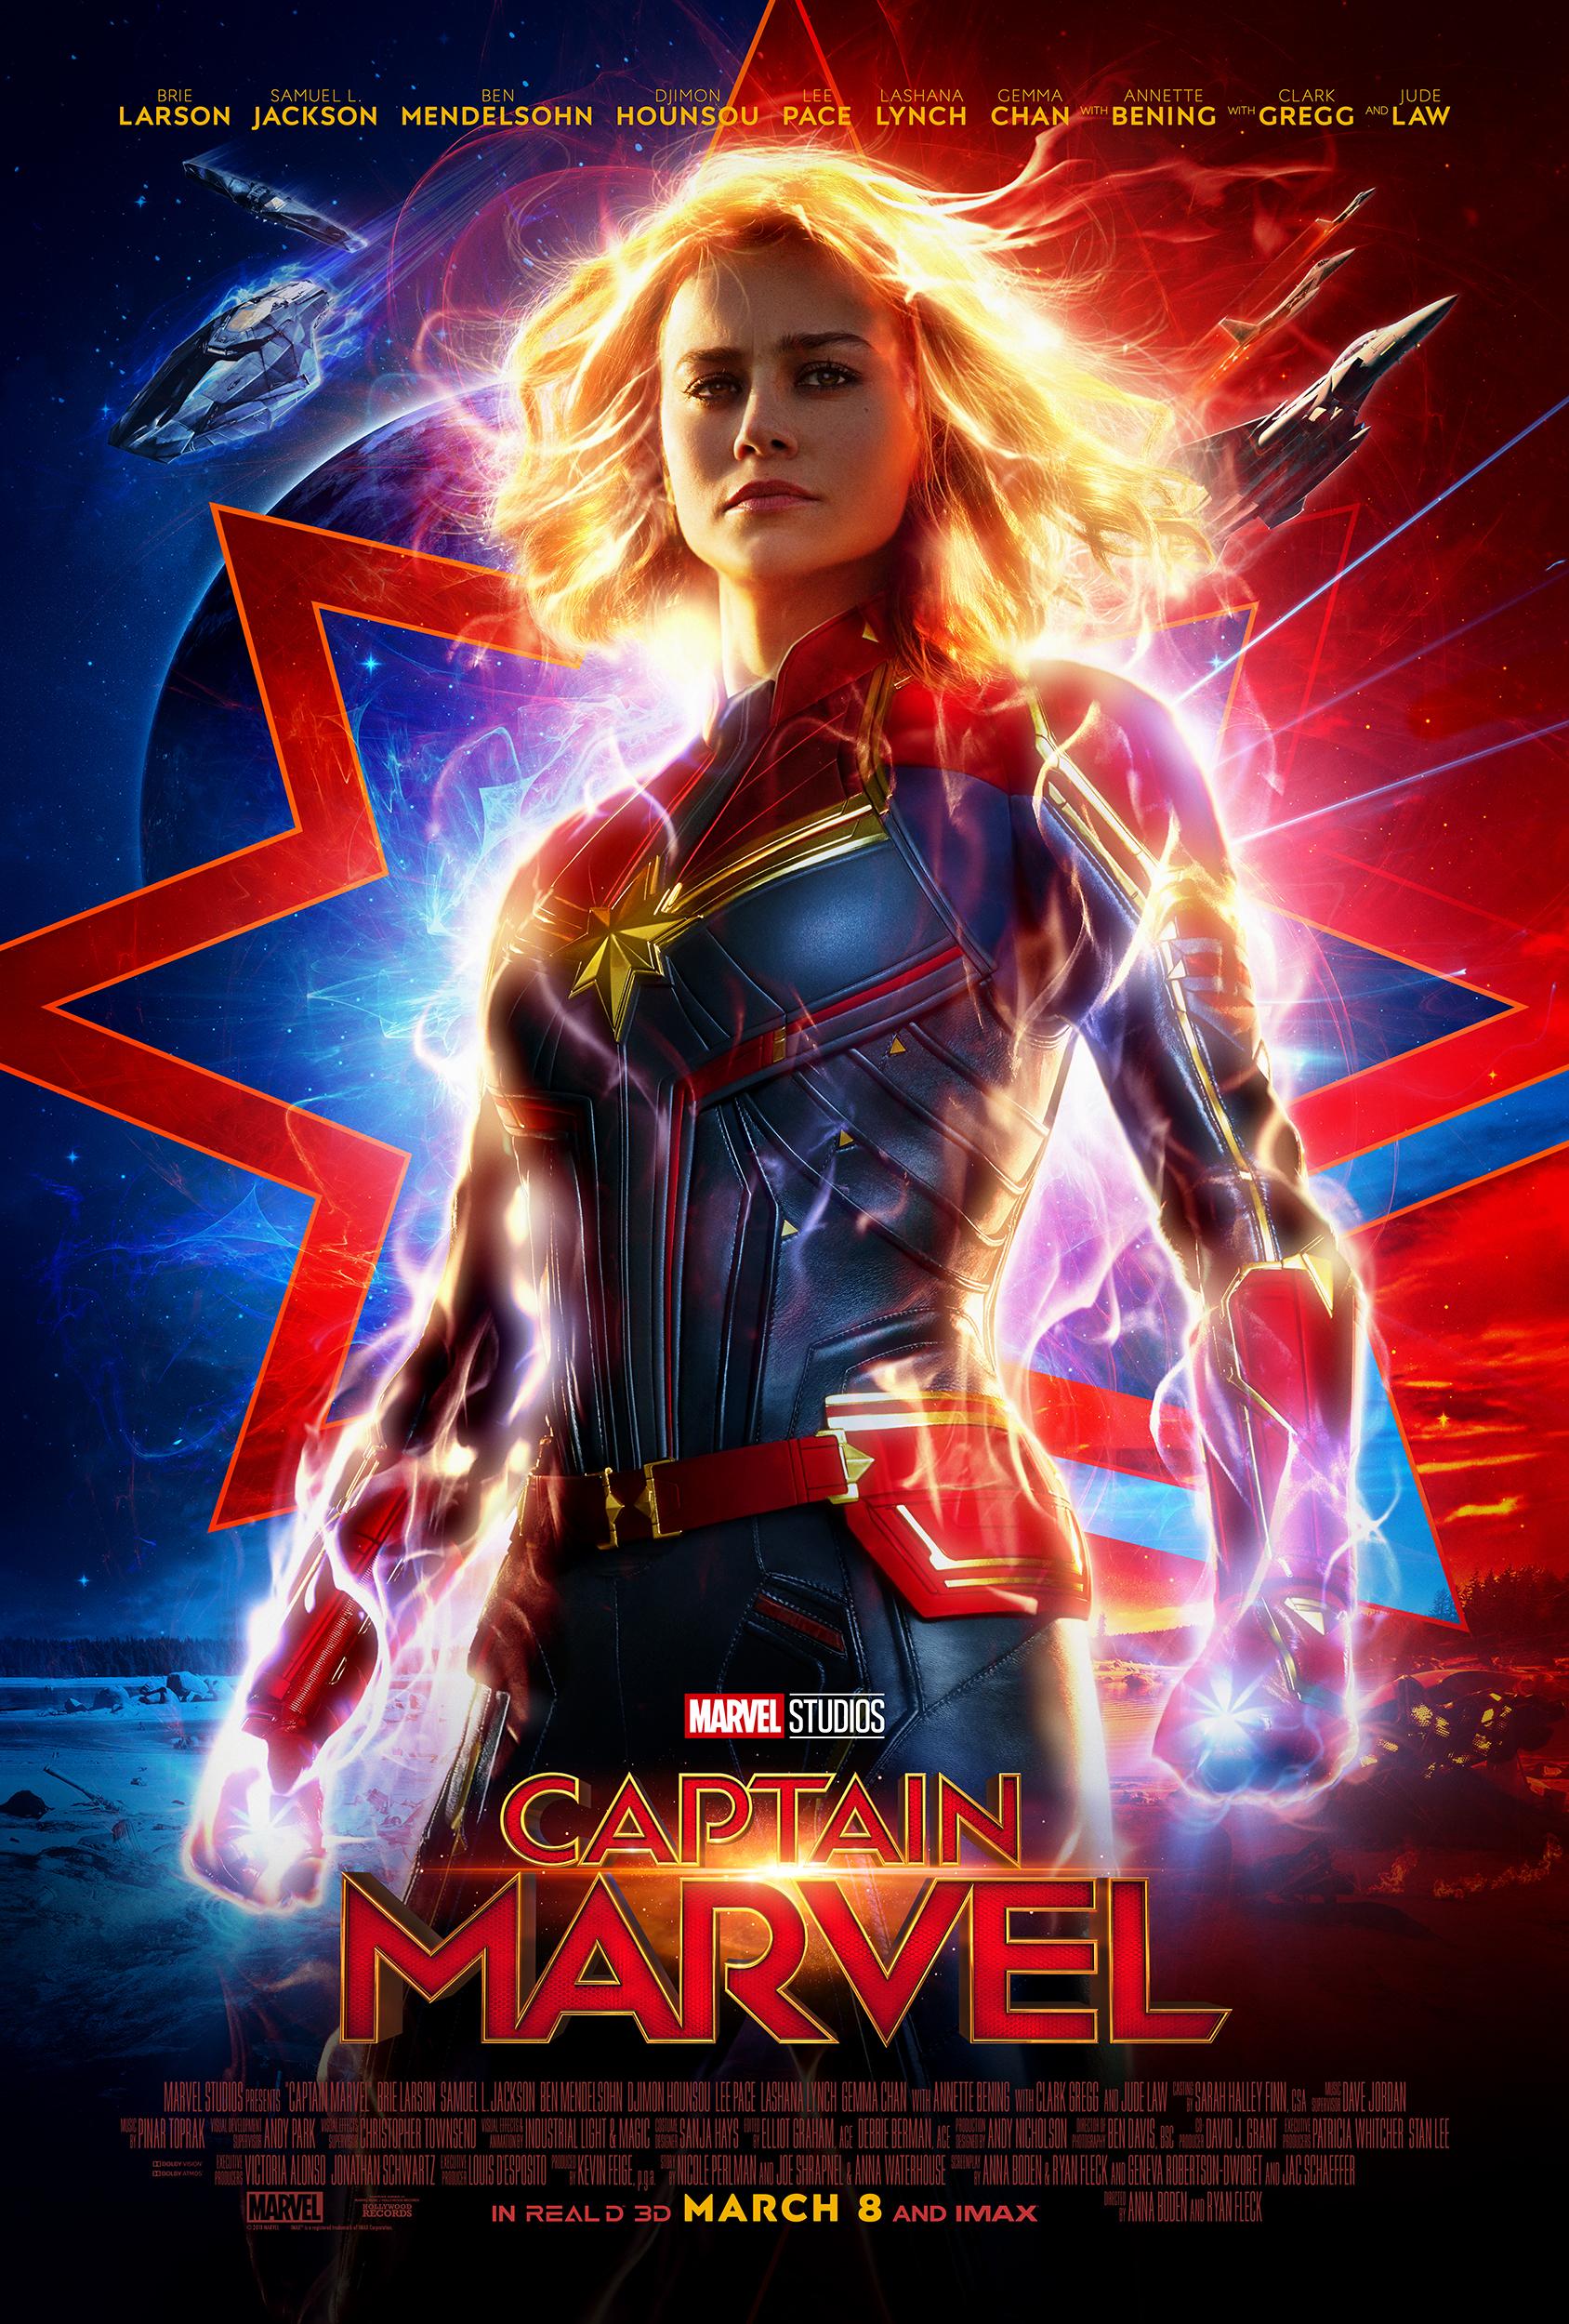 New Movie: Marvel Studios' CAPTAIN MARVEL